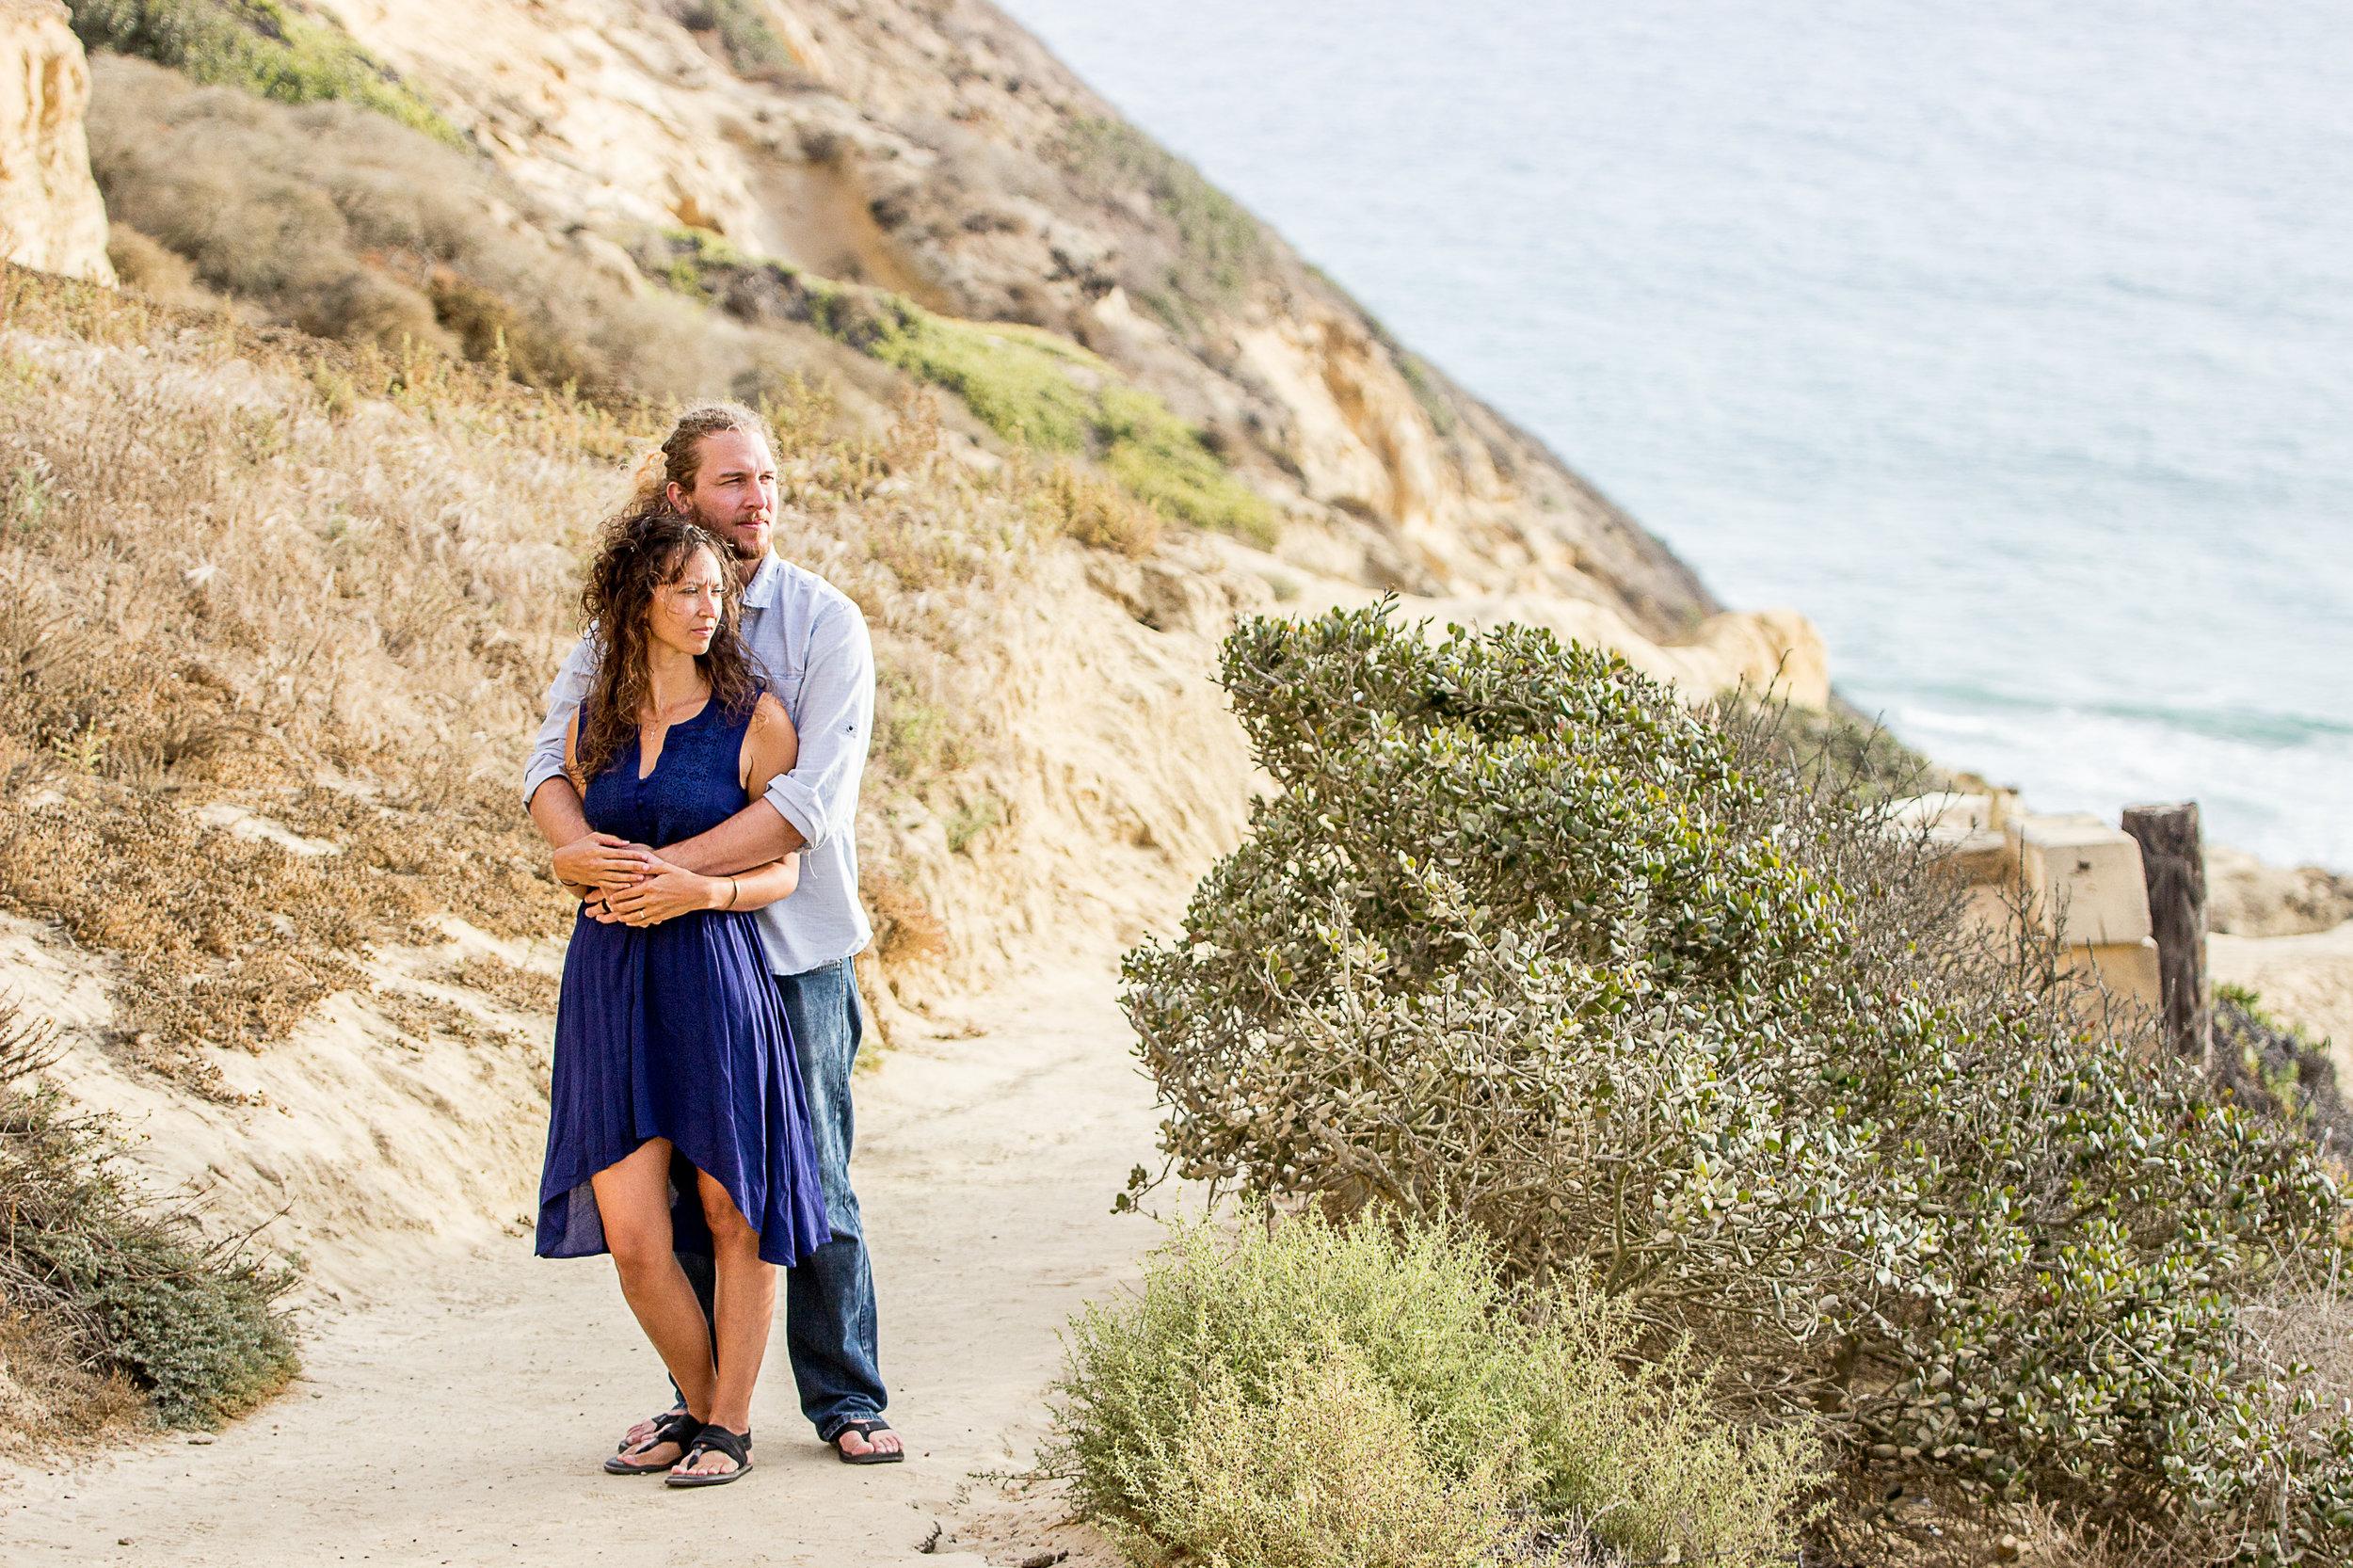 torrey-pines-gliderport-couples-session-anniversary-san-diego-photographer-sophia-elizabeth